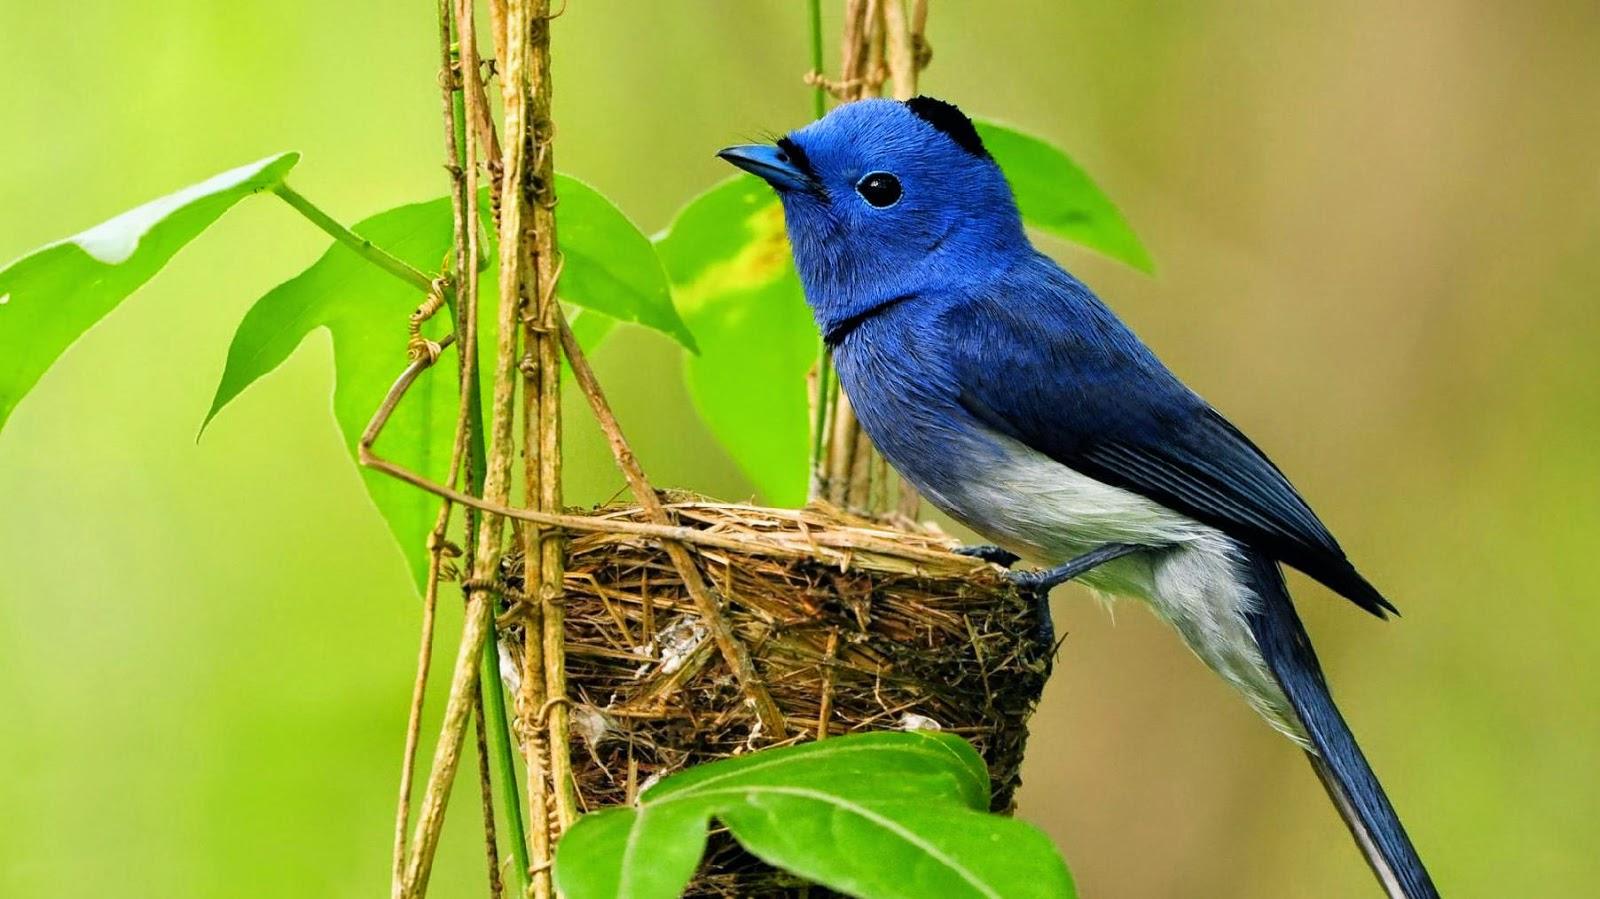 Wallpaper Gerak Gambar Burung Bird Full Hd 540713 Hd